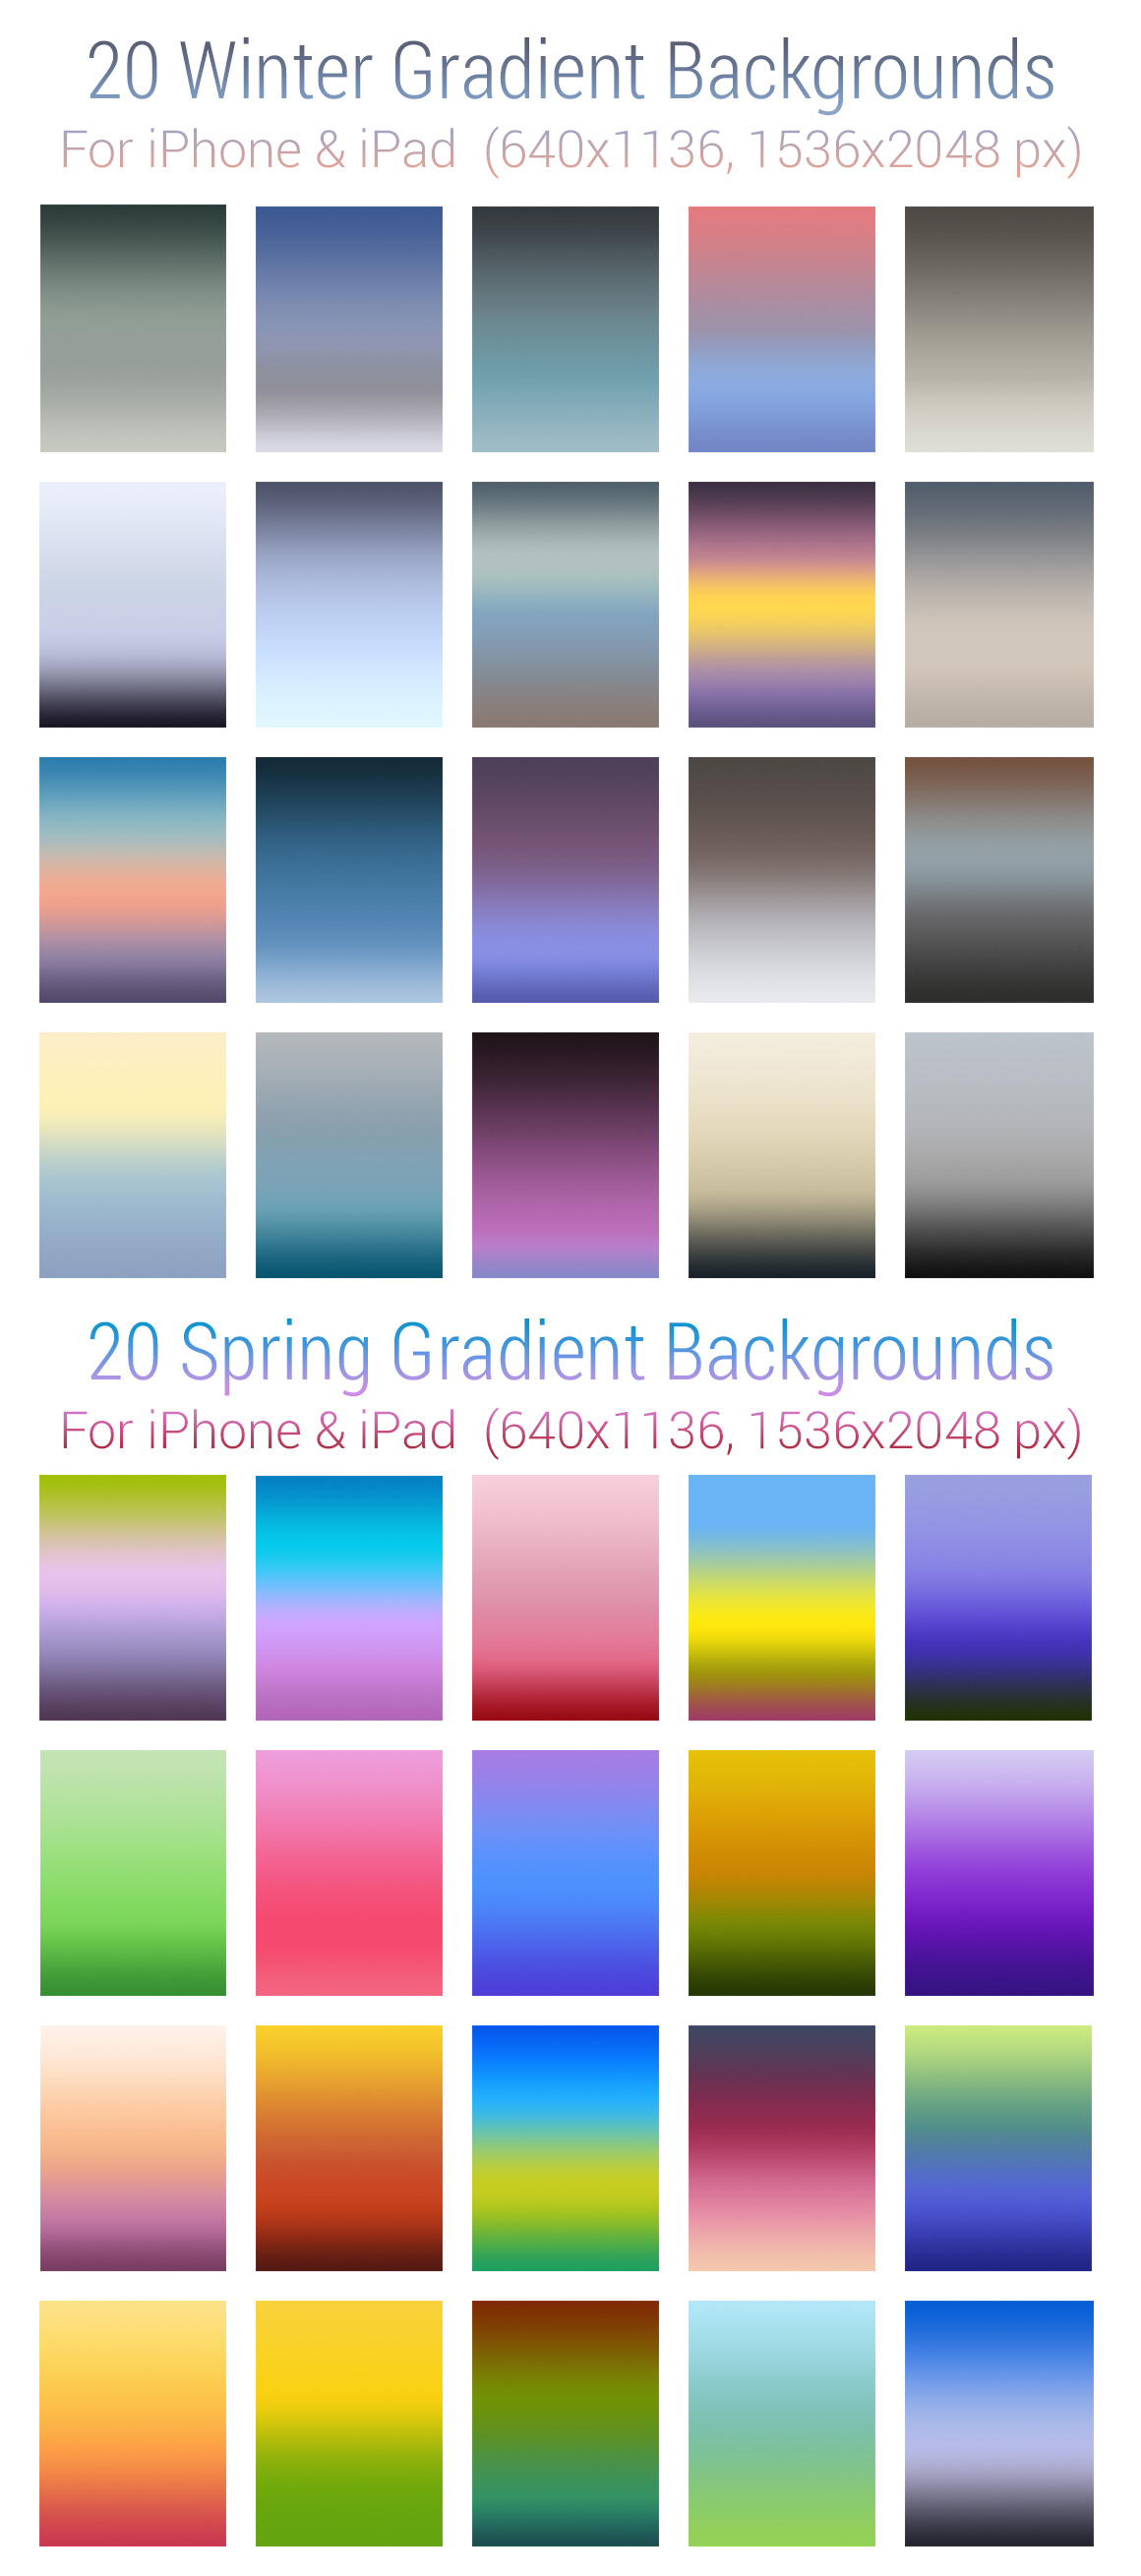 winter-spring-bg-iphone-ipad